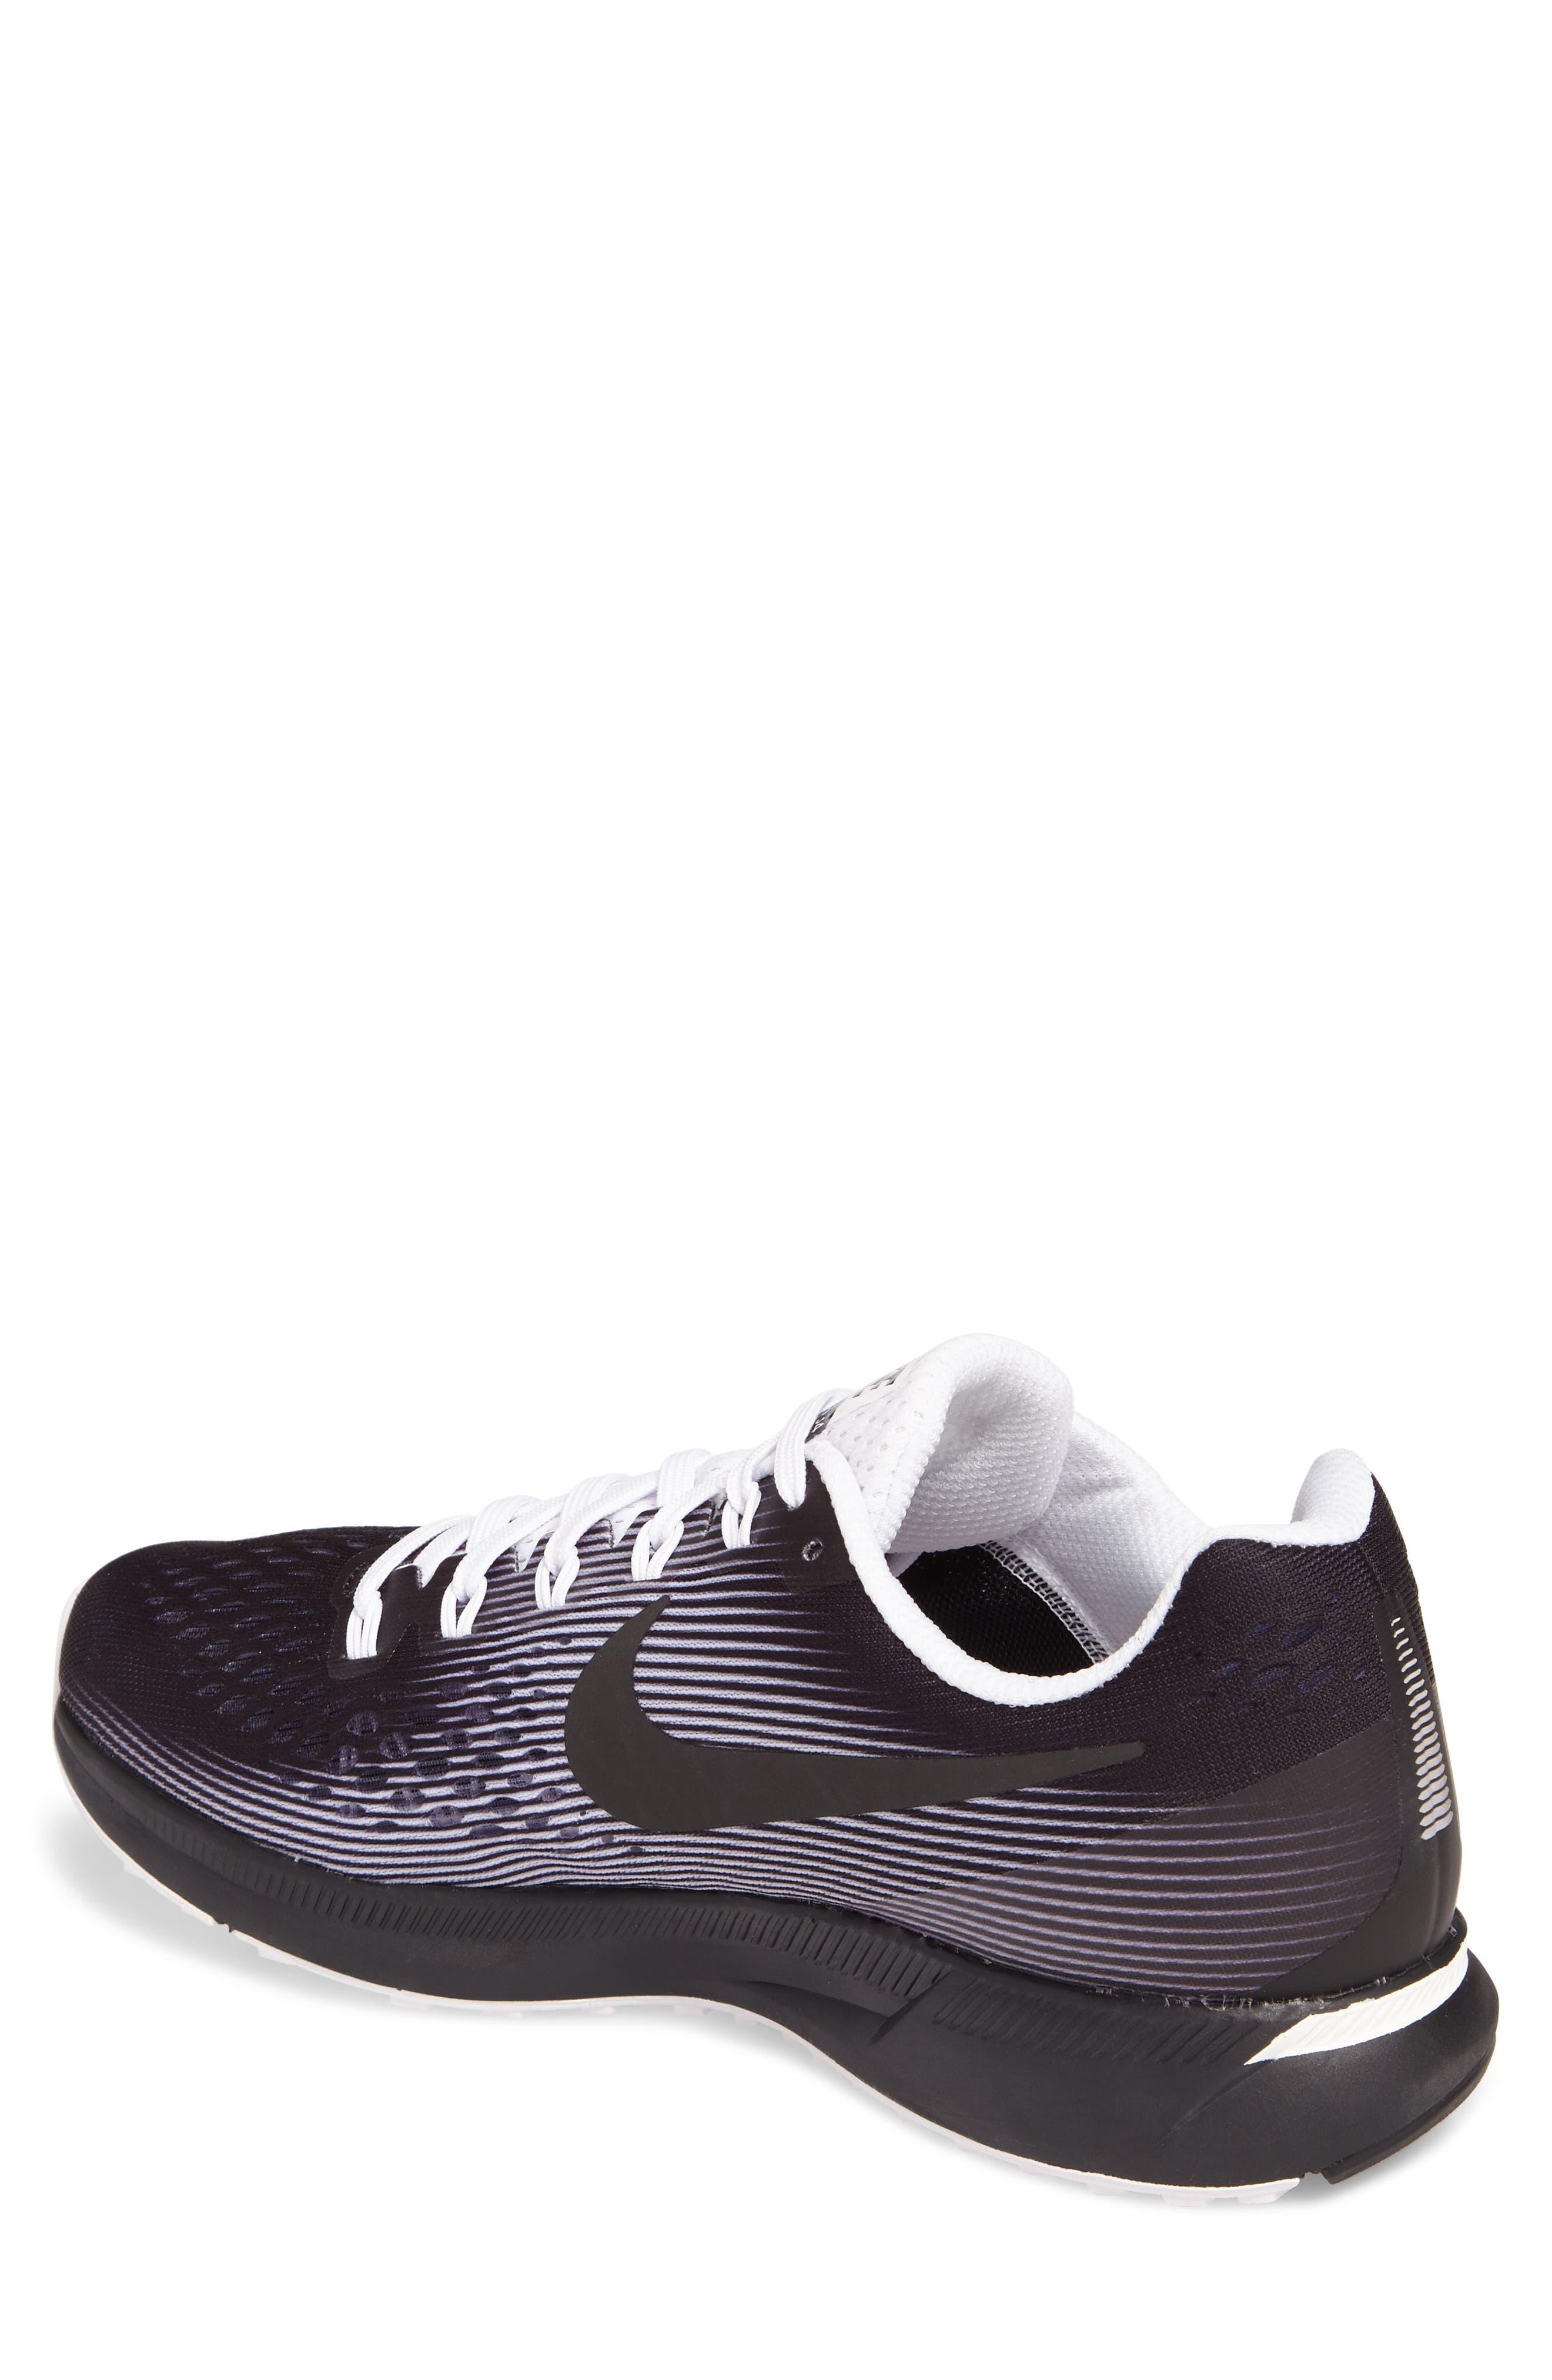 Air Zoom Pegasus 34 LE Running Shoe,                             Alternate thumbnail 2, color,                             001